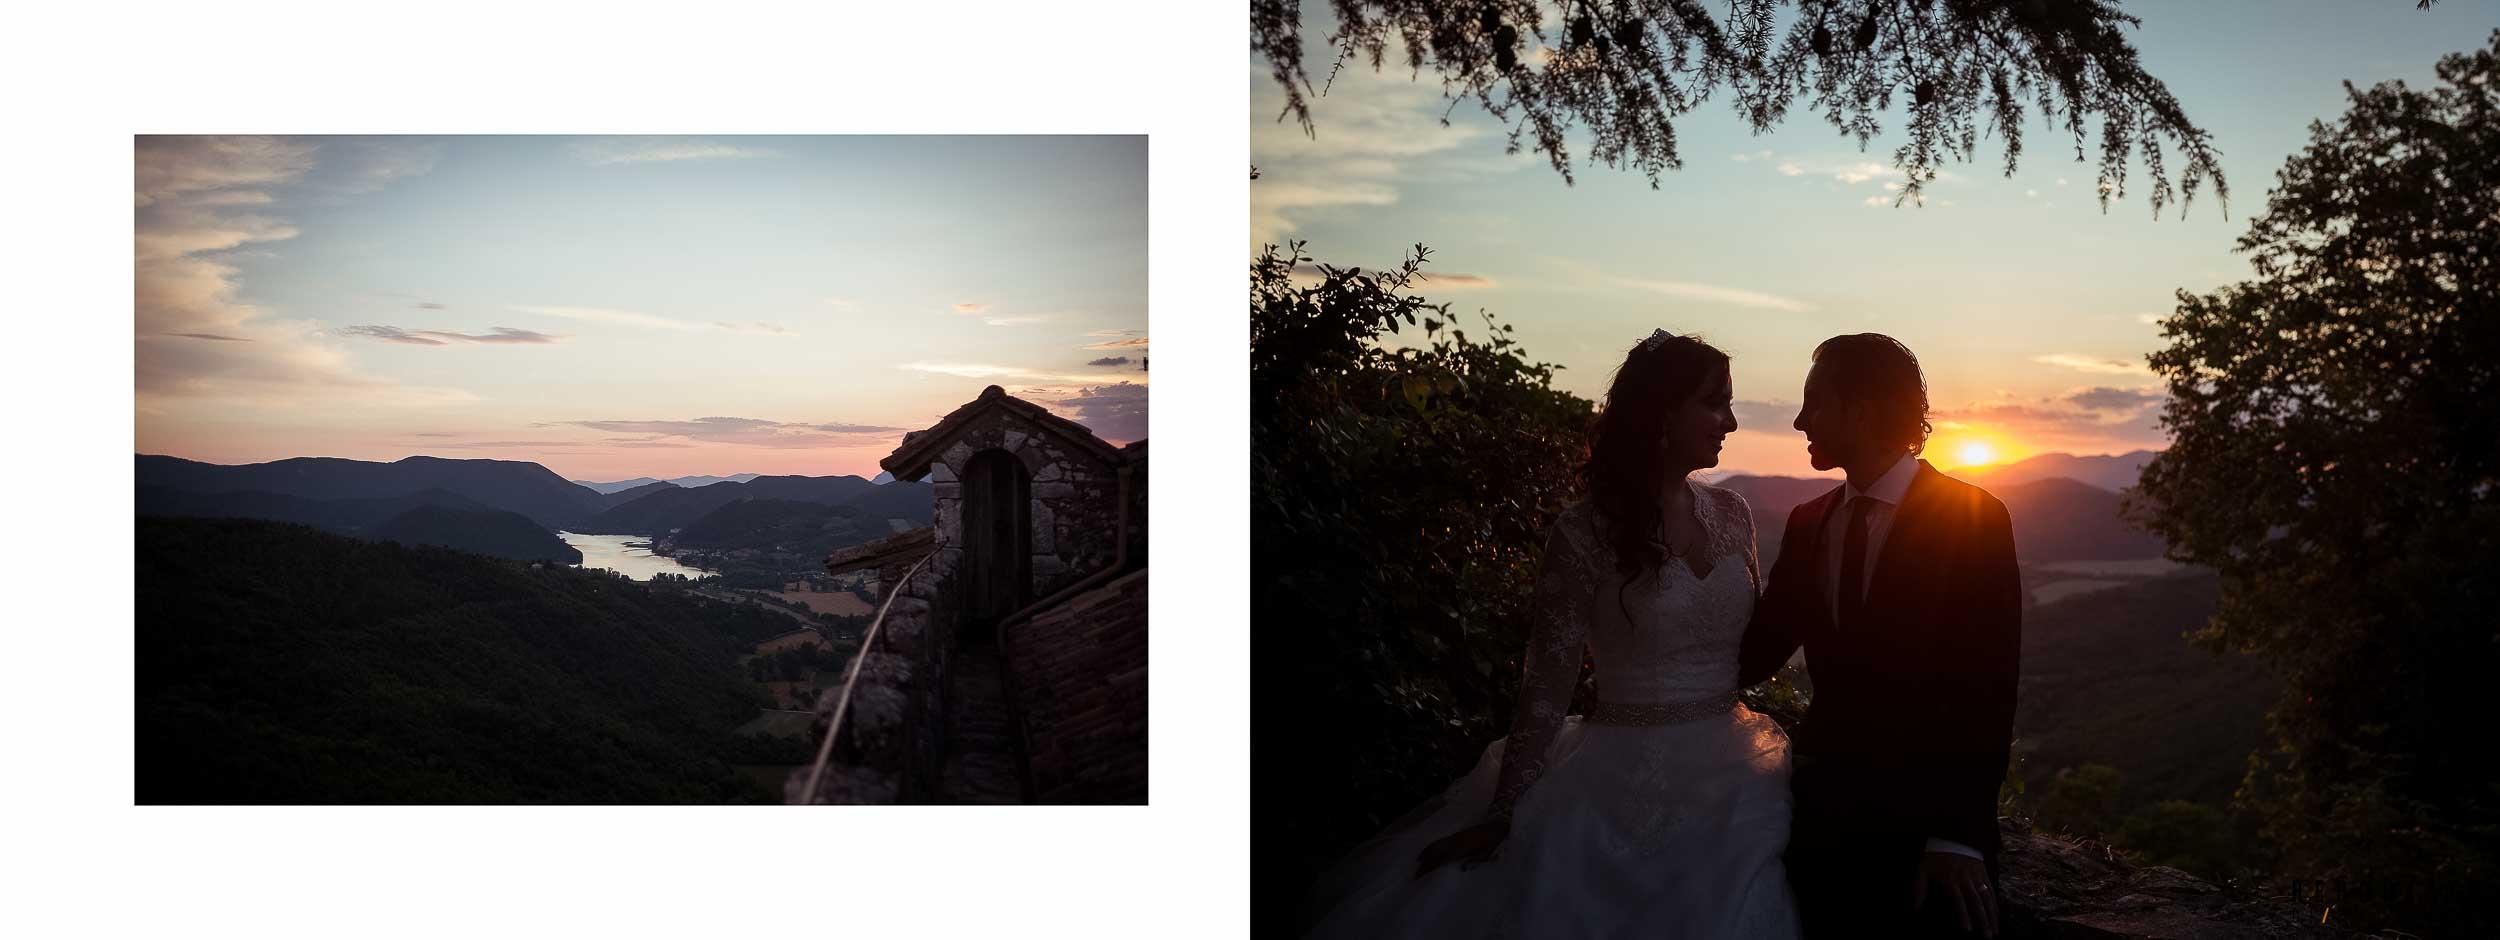 labro_wedding18